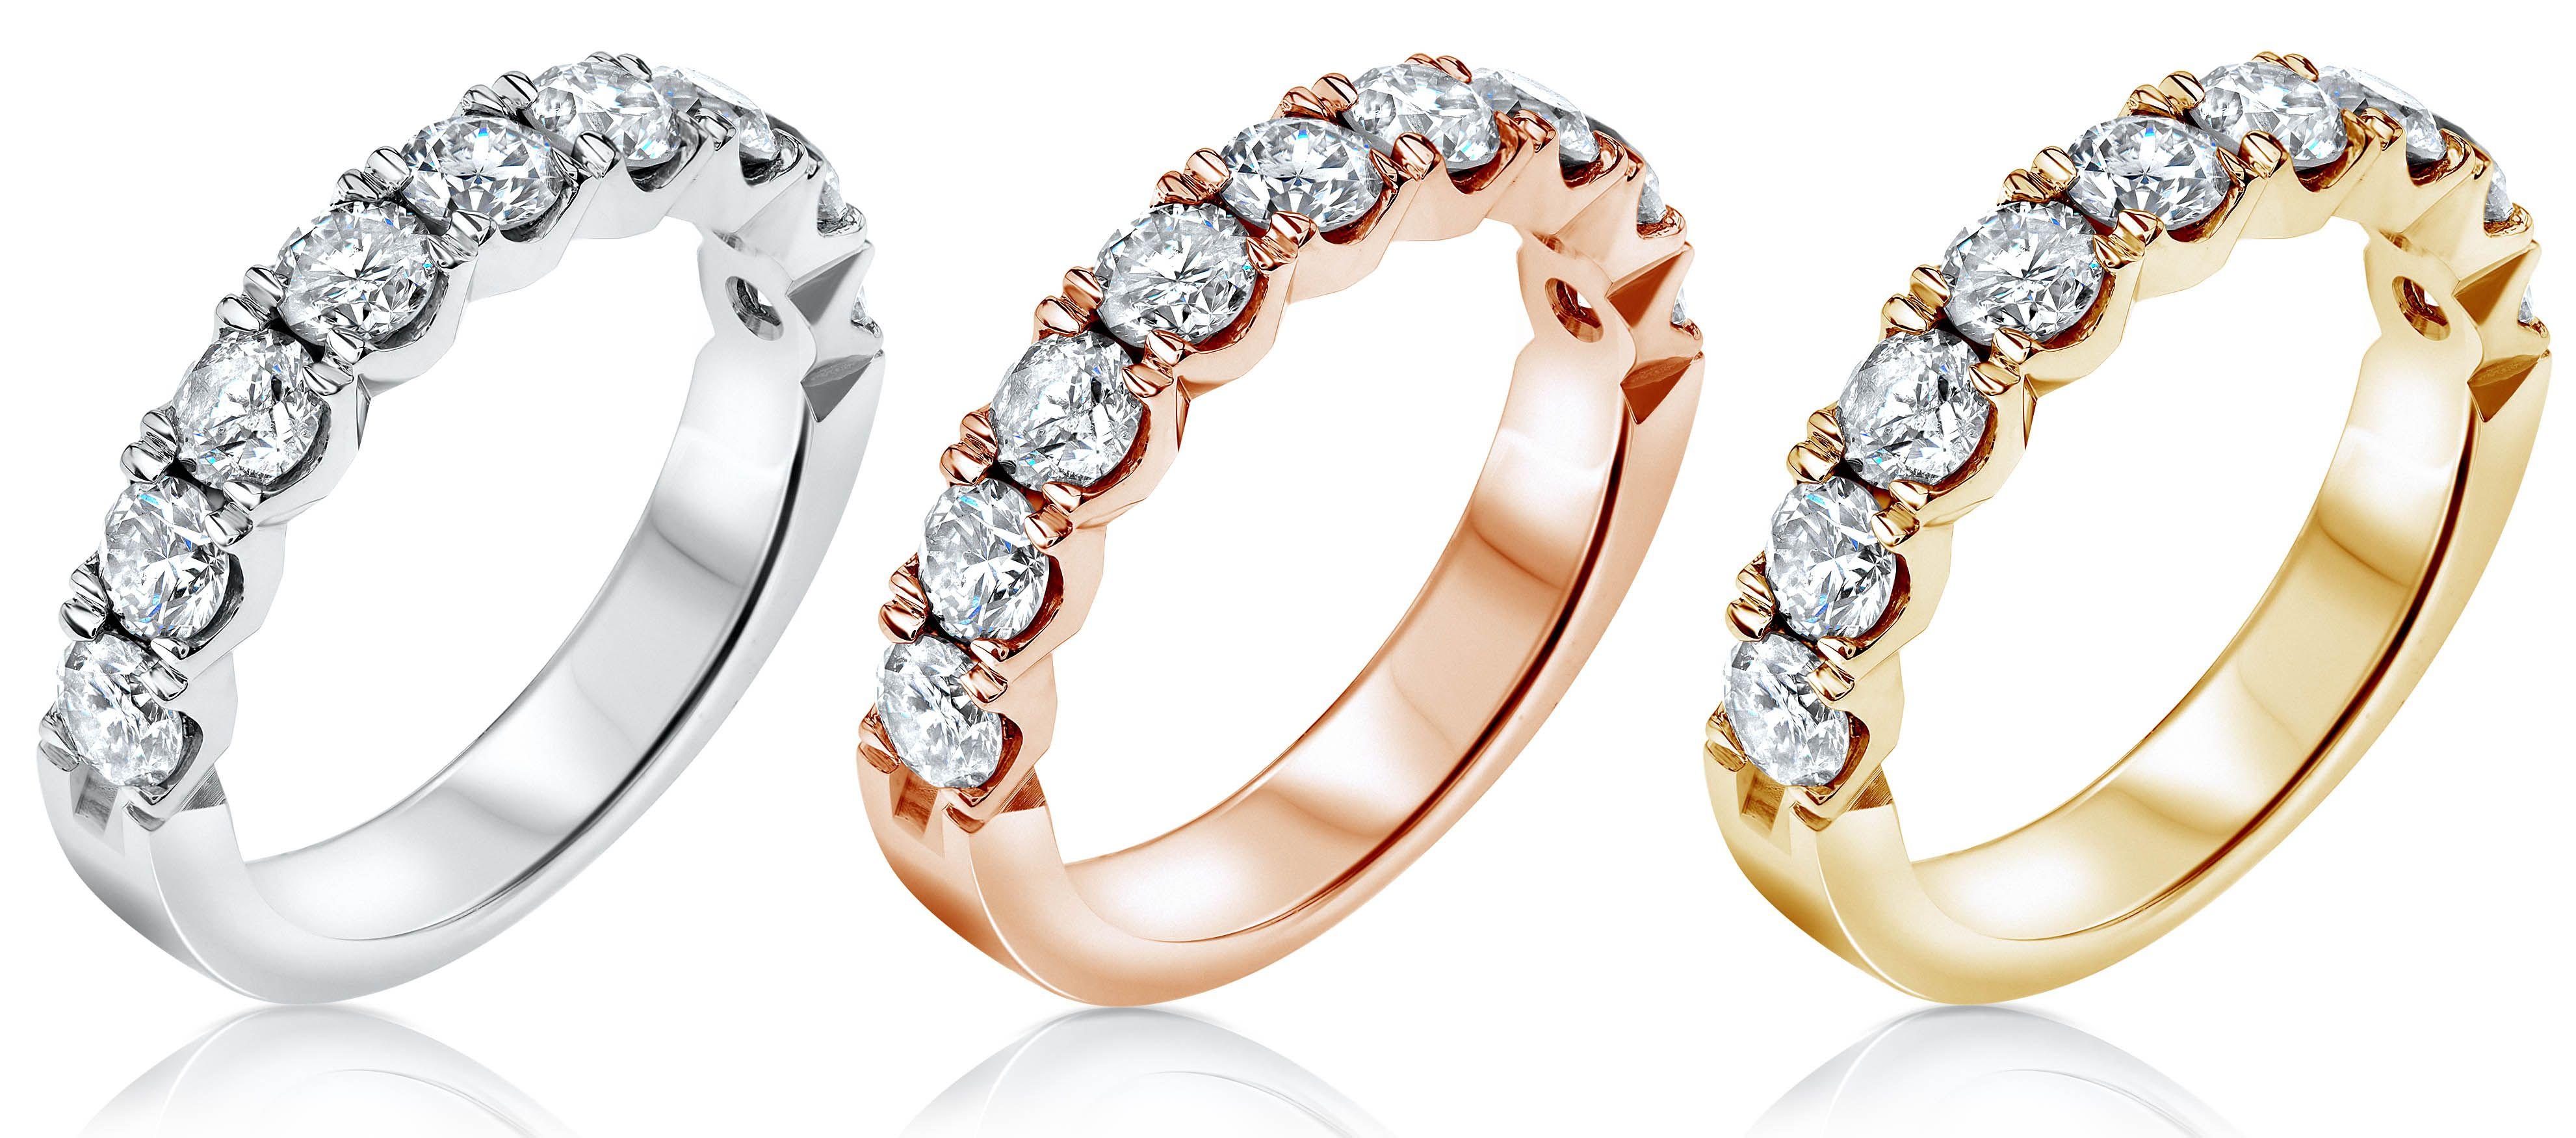 1.50ct Diamond Ring, I1 Clarity, 14K Gold